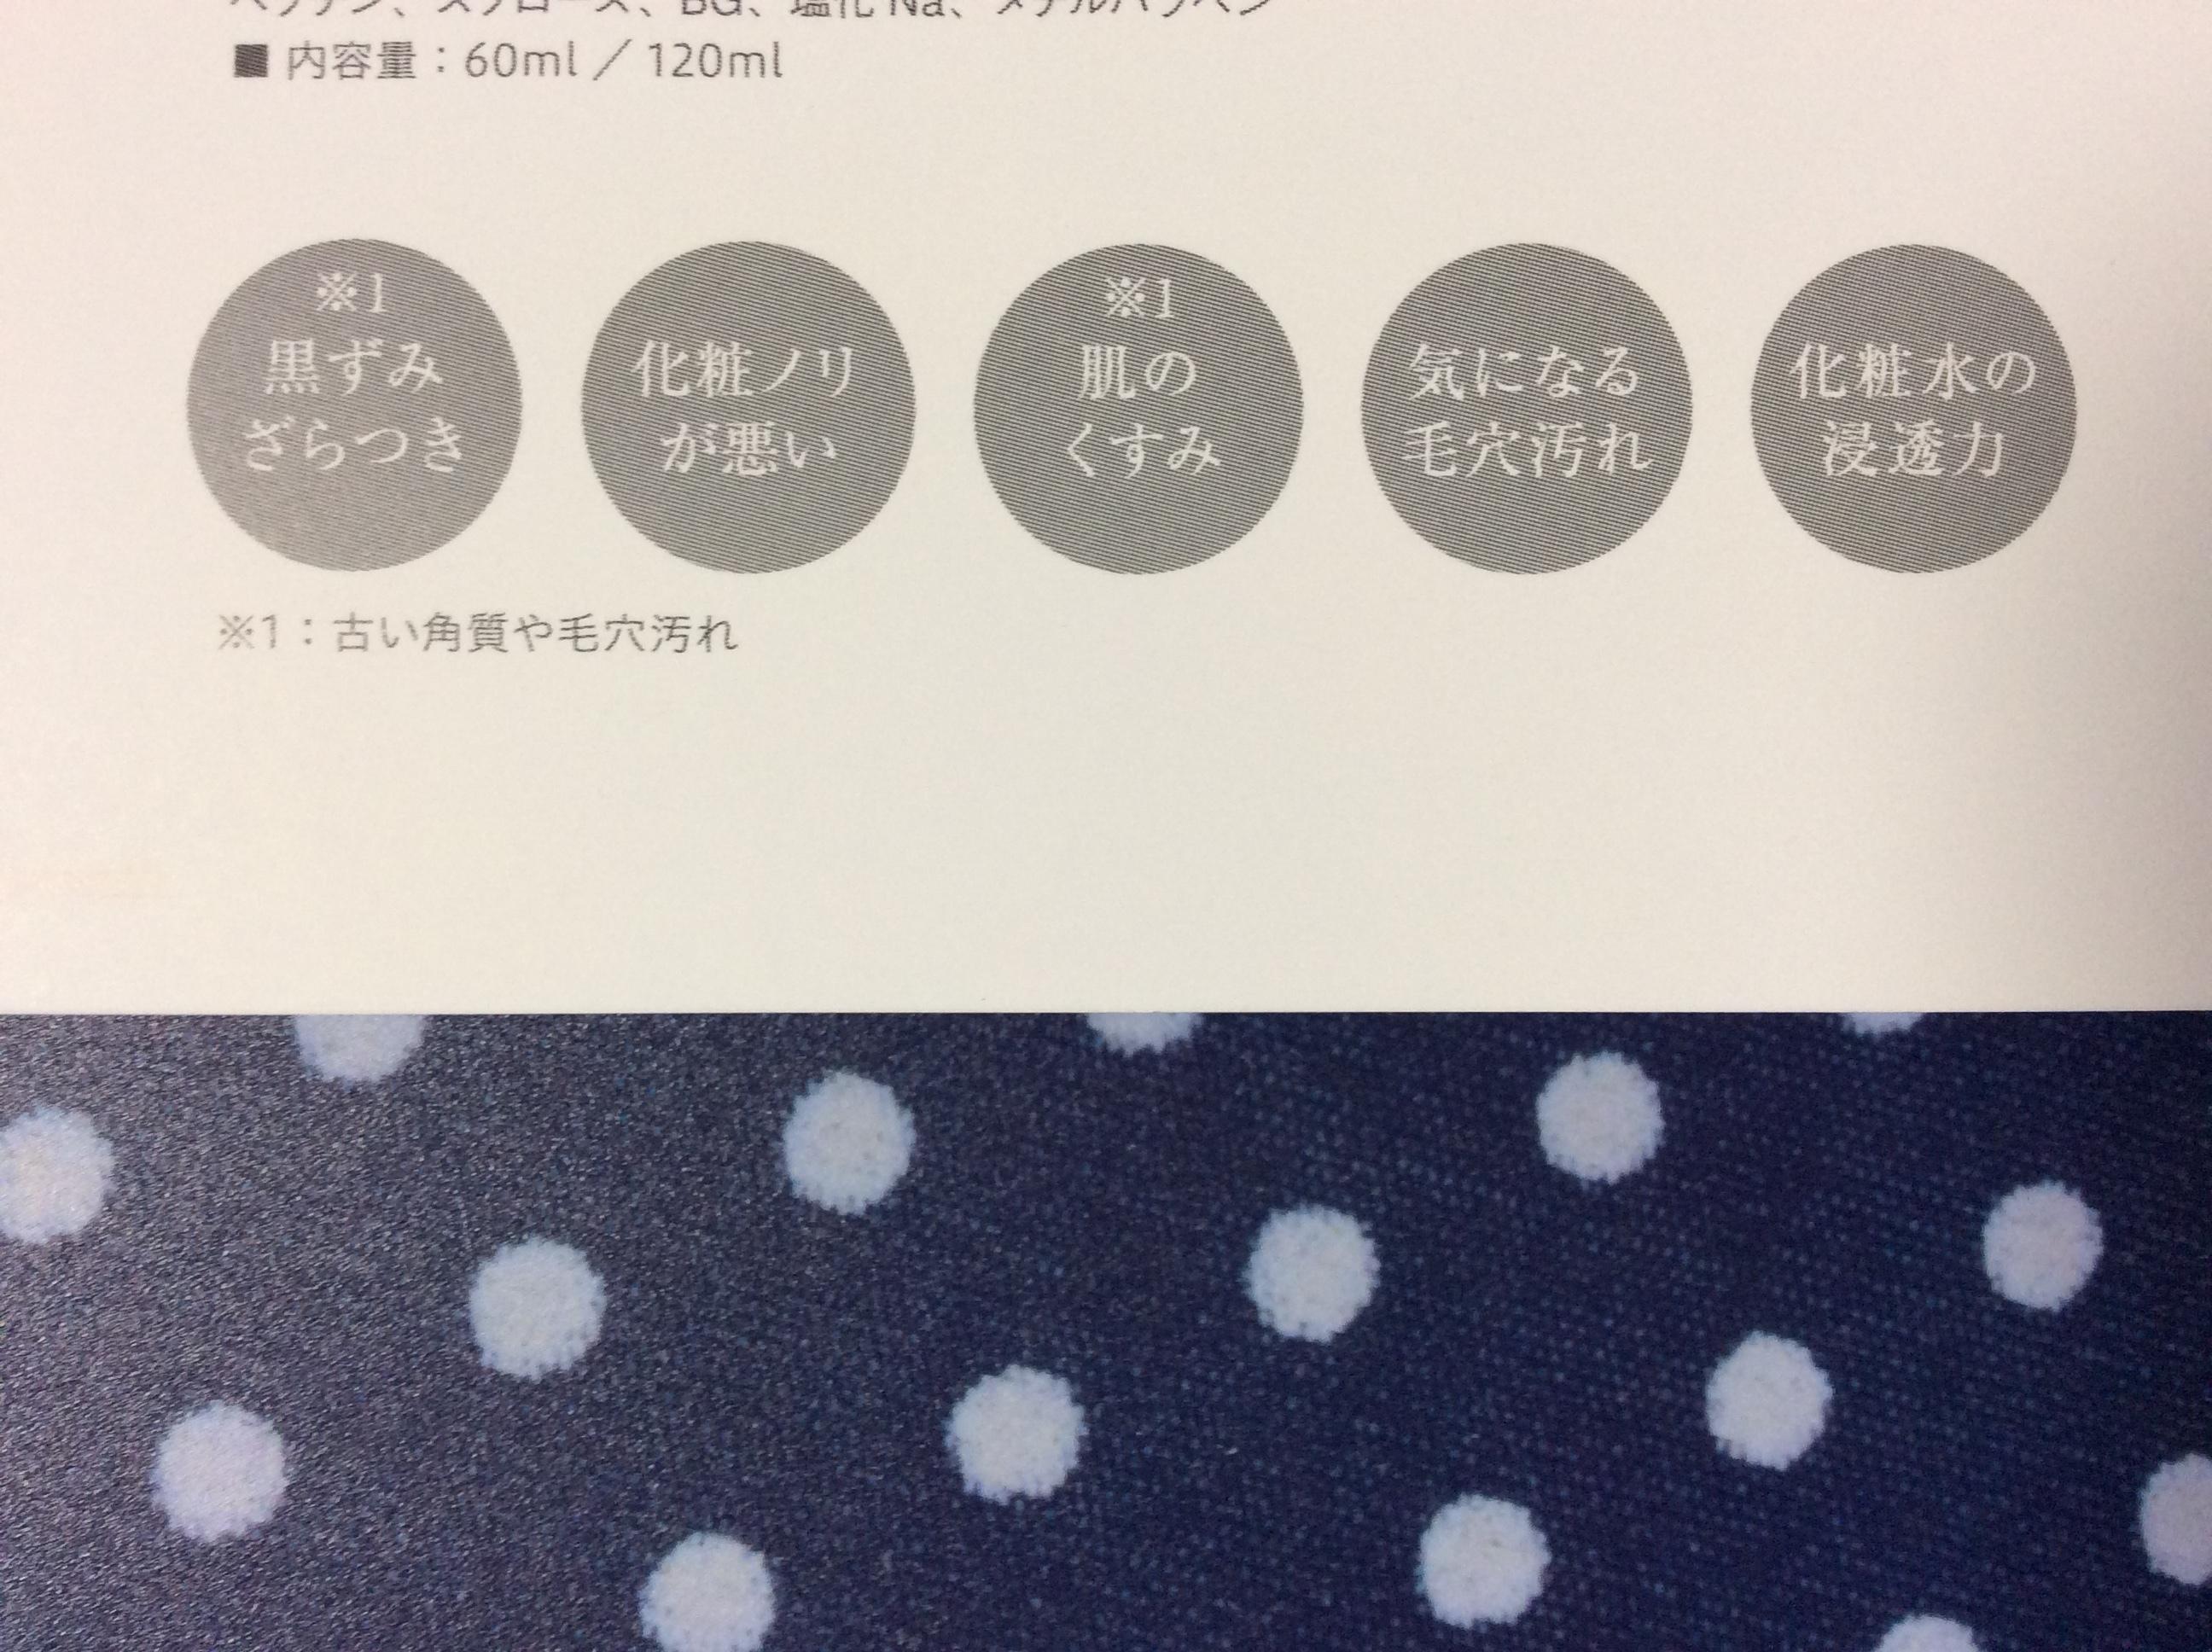 7F2DFBE2-817F-4766-9661-EB4E1E61EBB7.jpeg